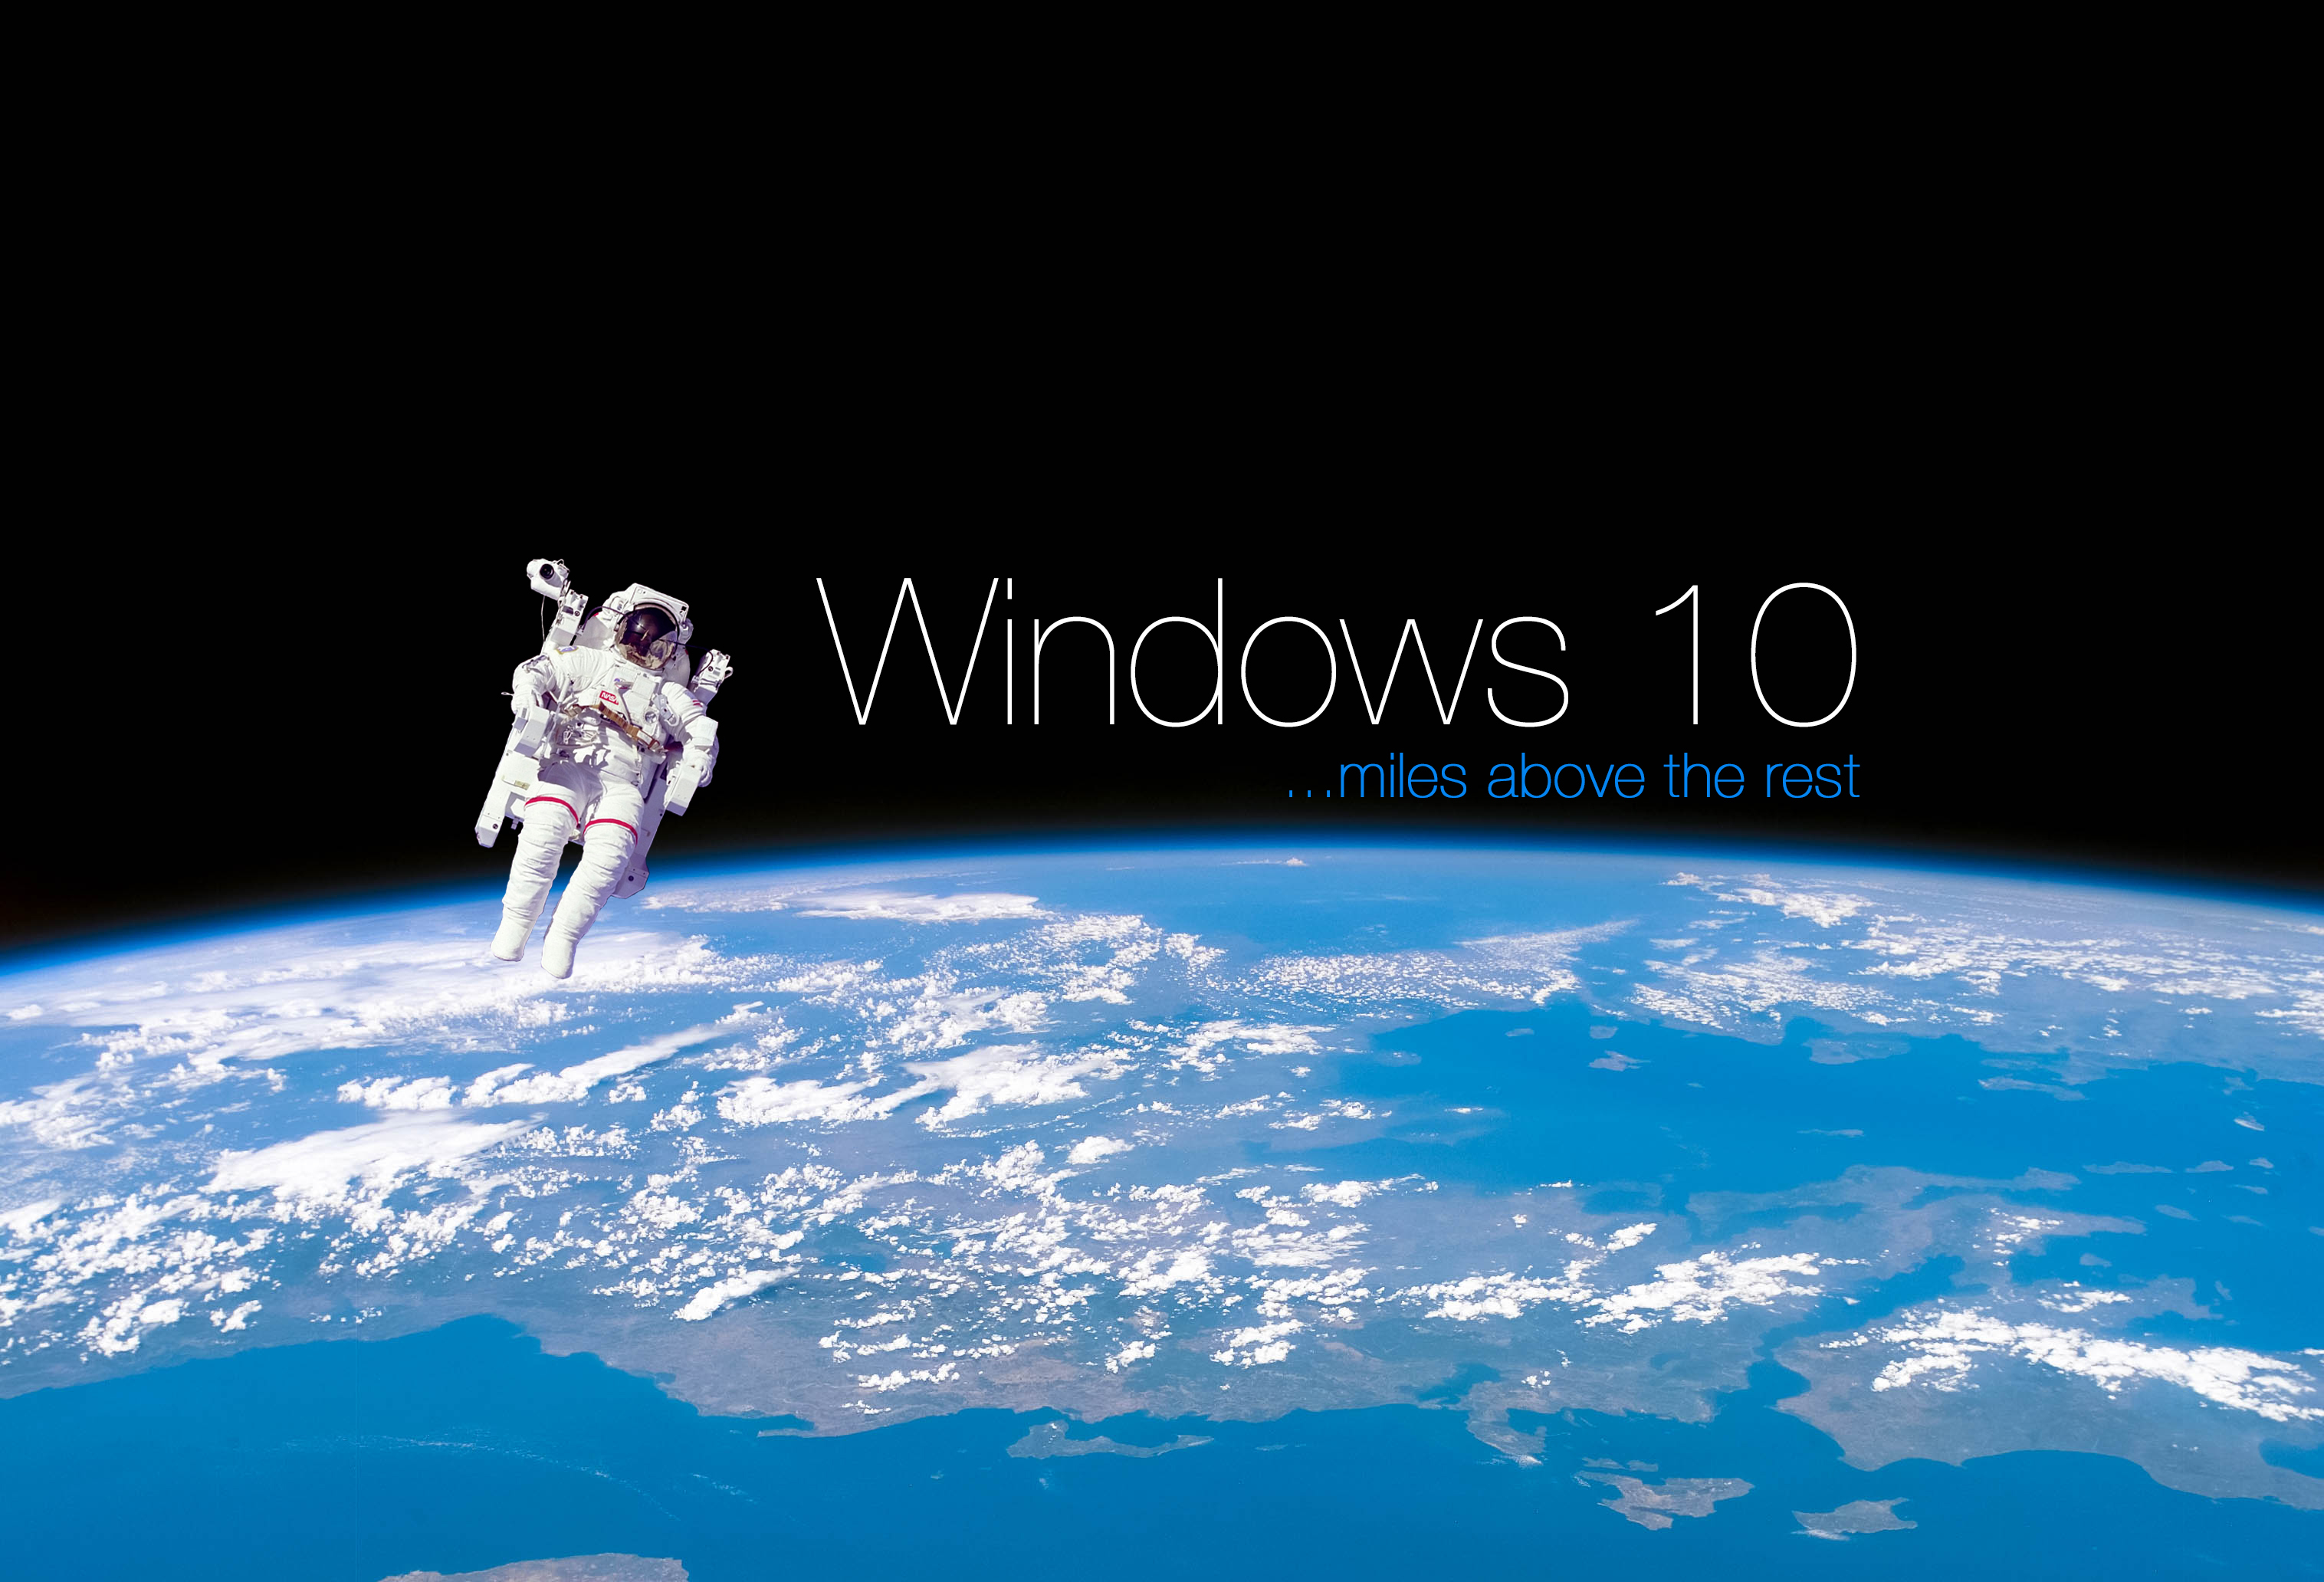 Windows 10 Wallpaper hd Windows 10 Wallpapers 3032x2064